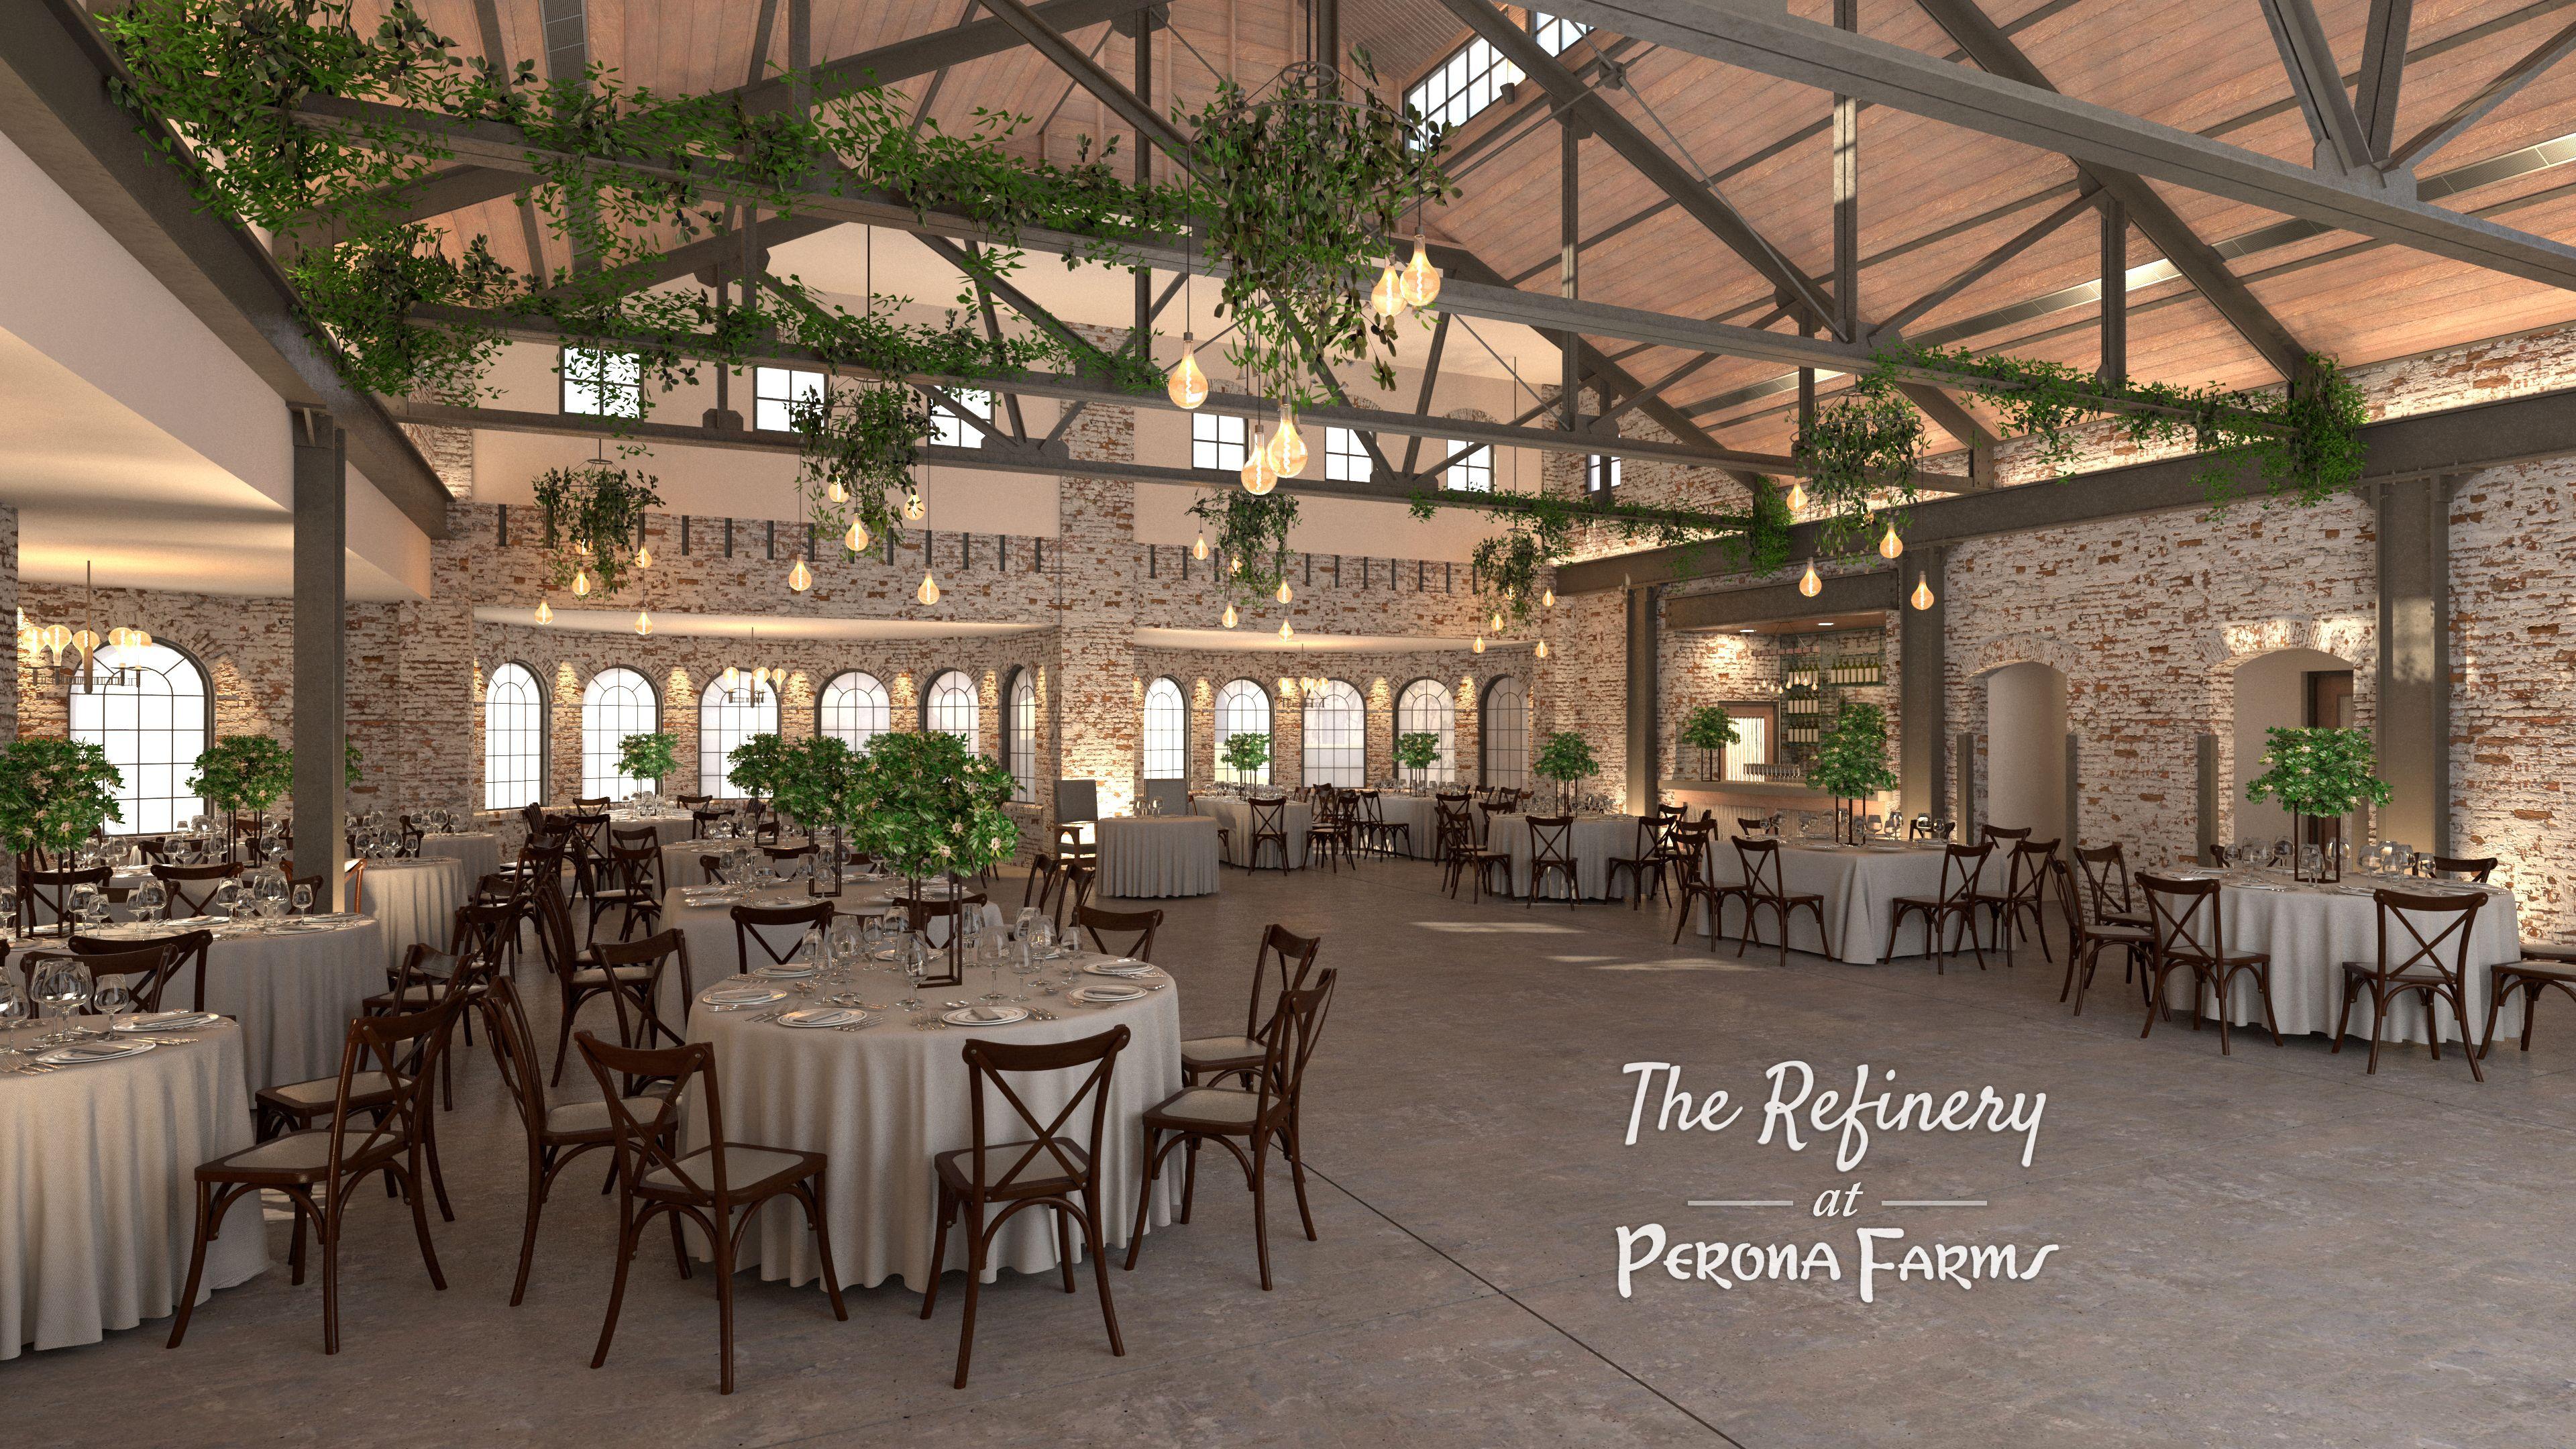 19+ Perona farms wedding pricing information